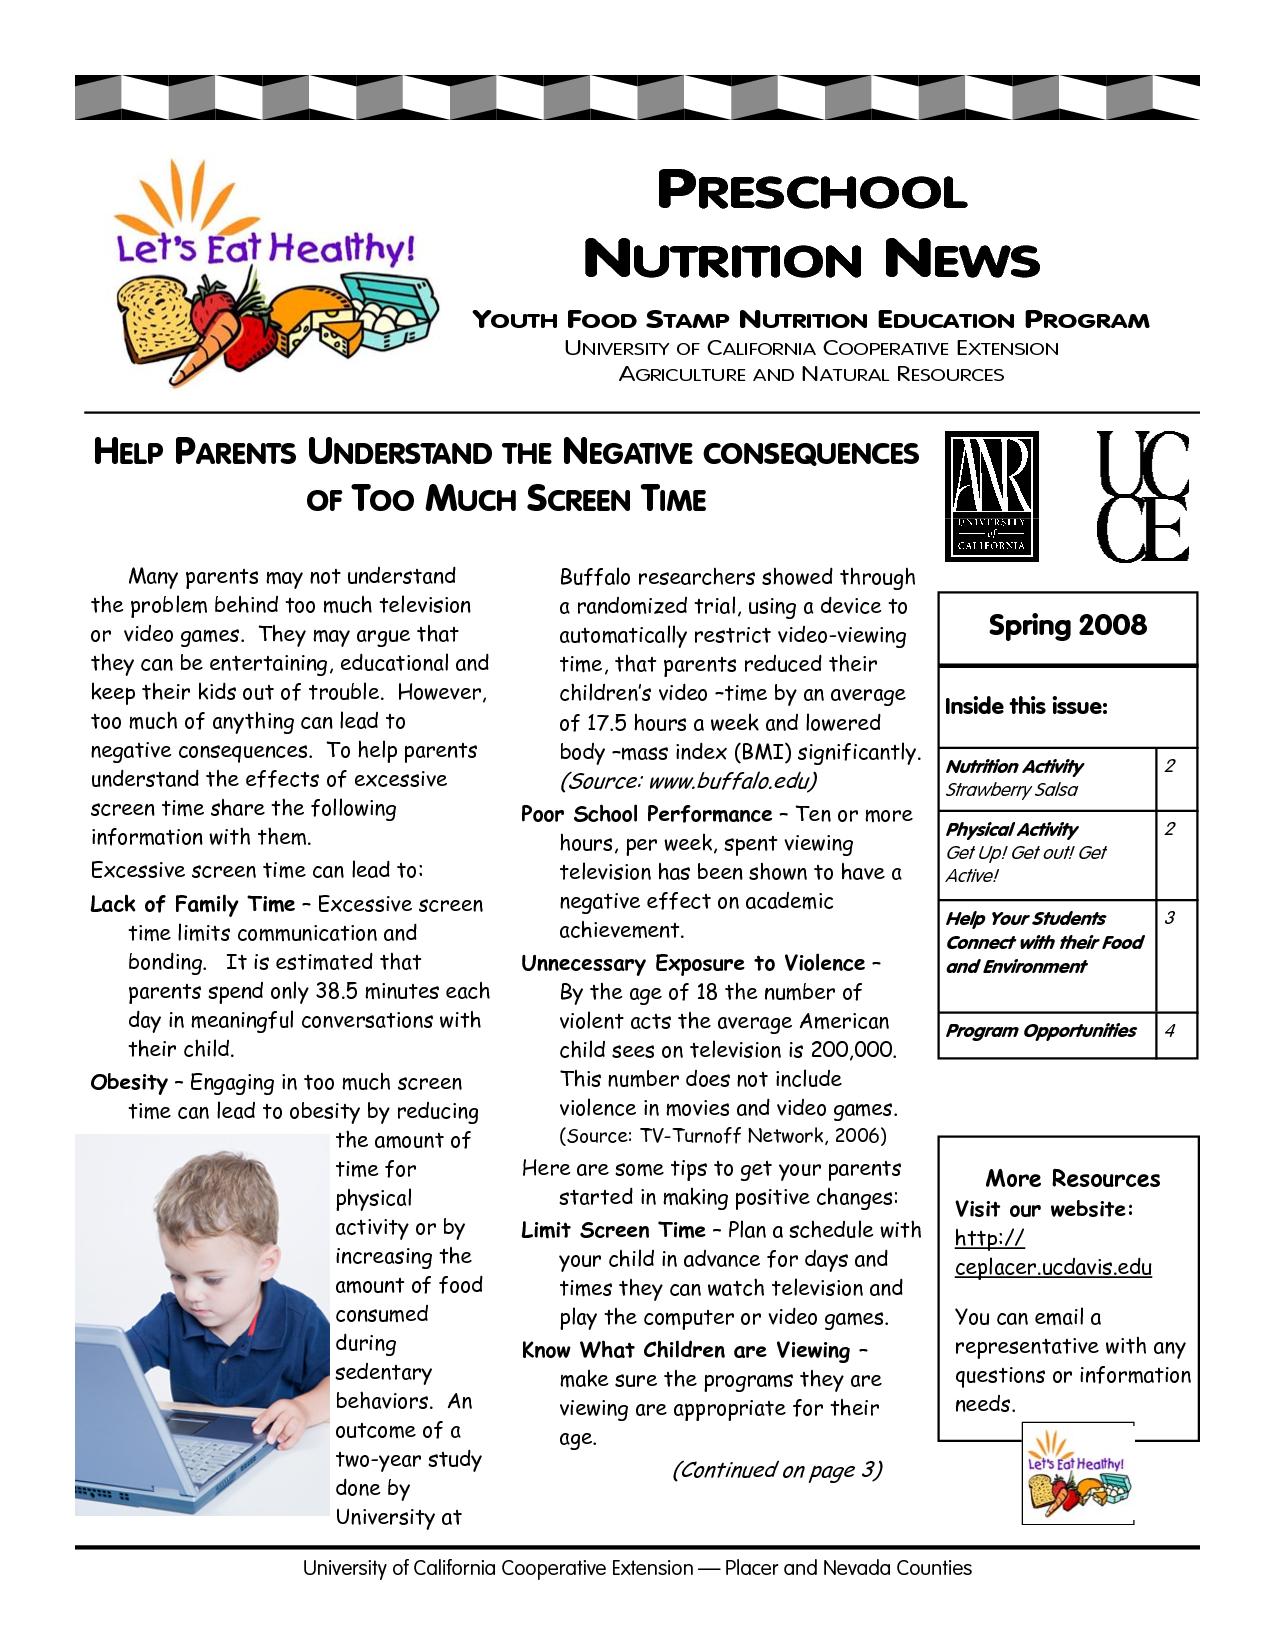 December School Newsletter Ideas informed about